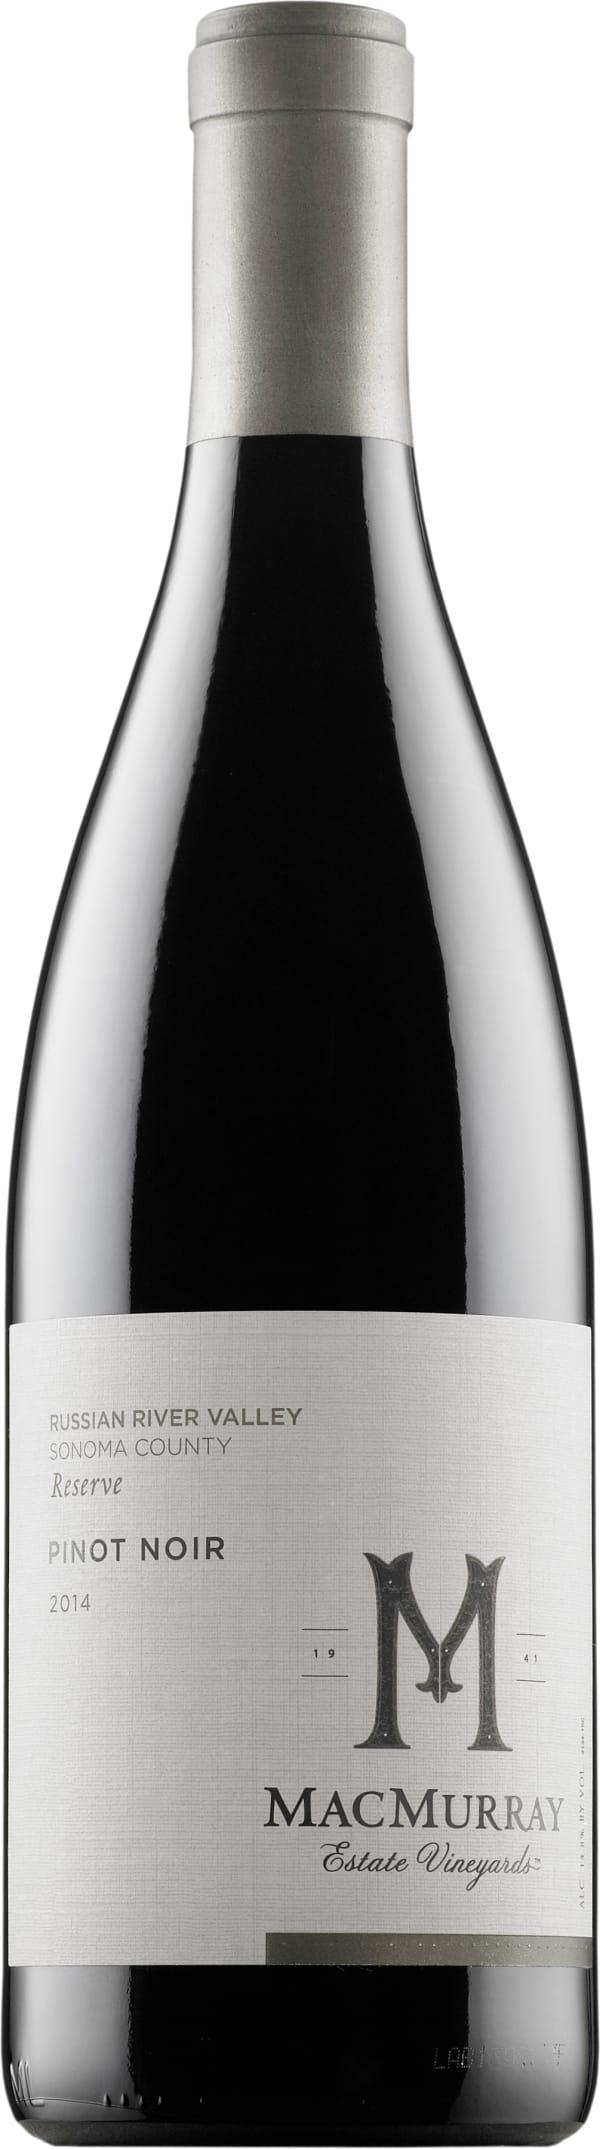 MacMurray Reserve Pinot Noir 2014